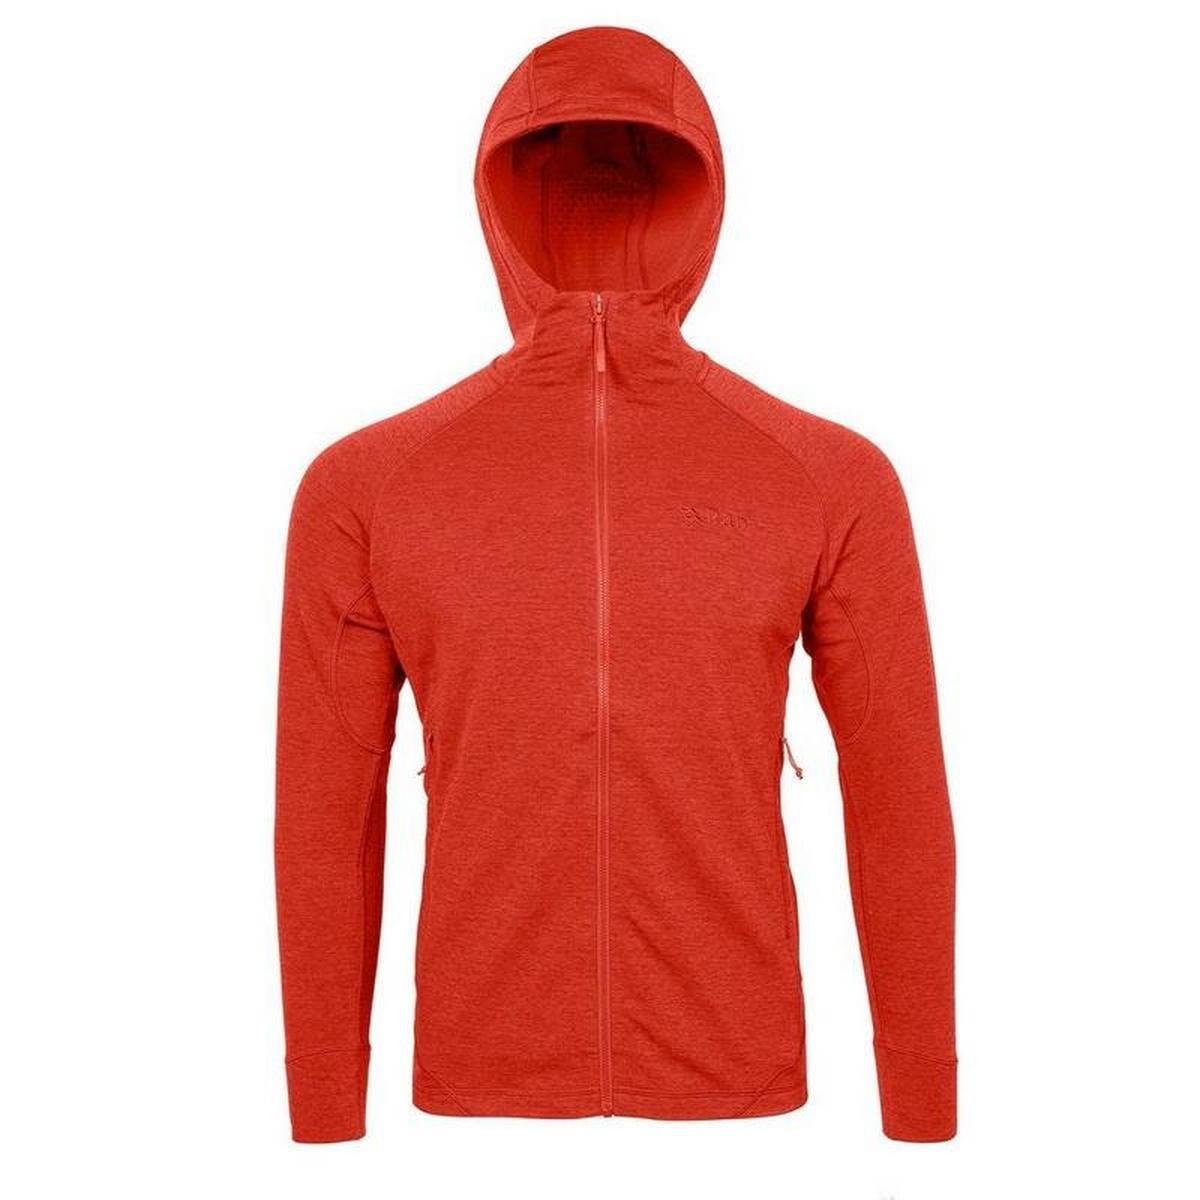 Rab Men's Rab Nexus Hooded Fleece Jacket - Orange